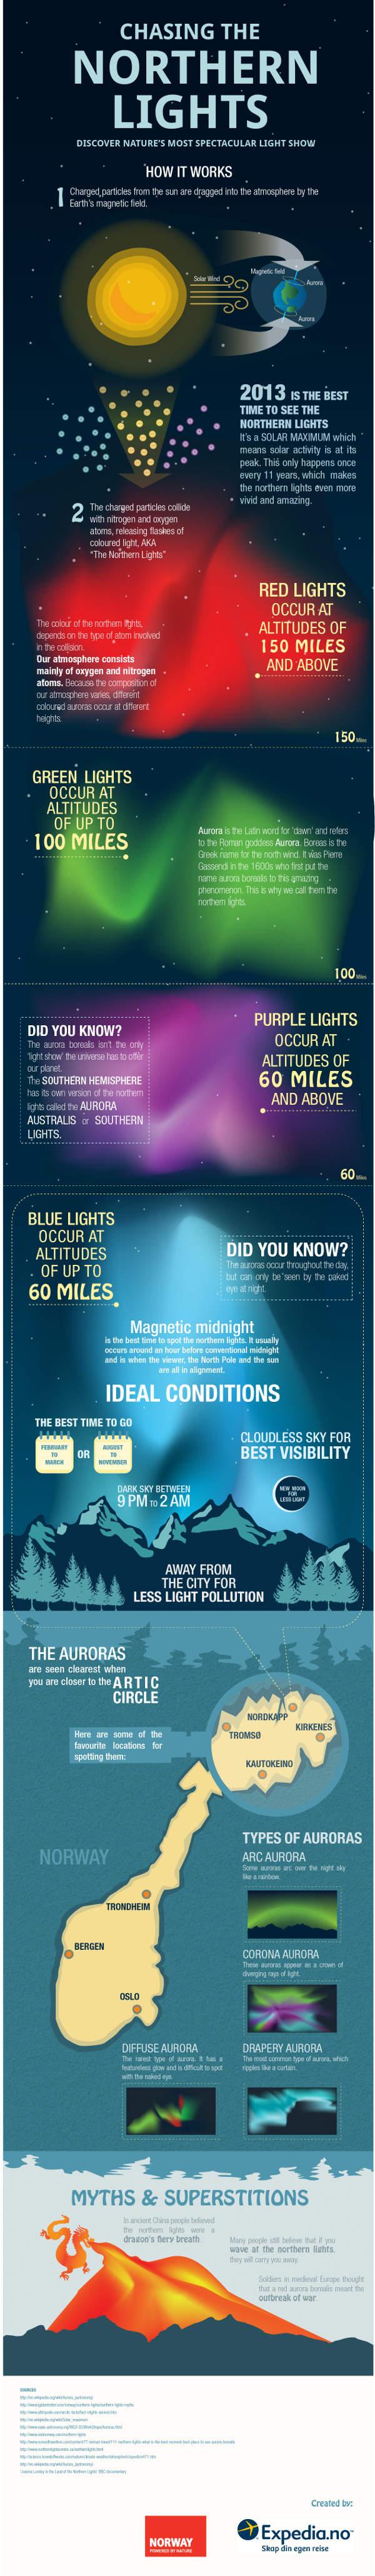 01 northern-lights-infographic-en